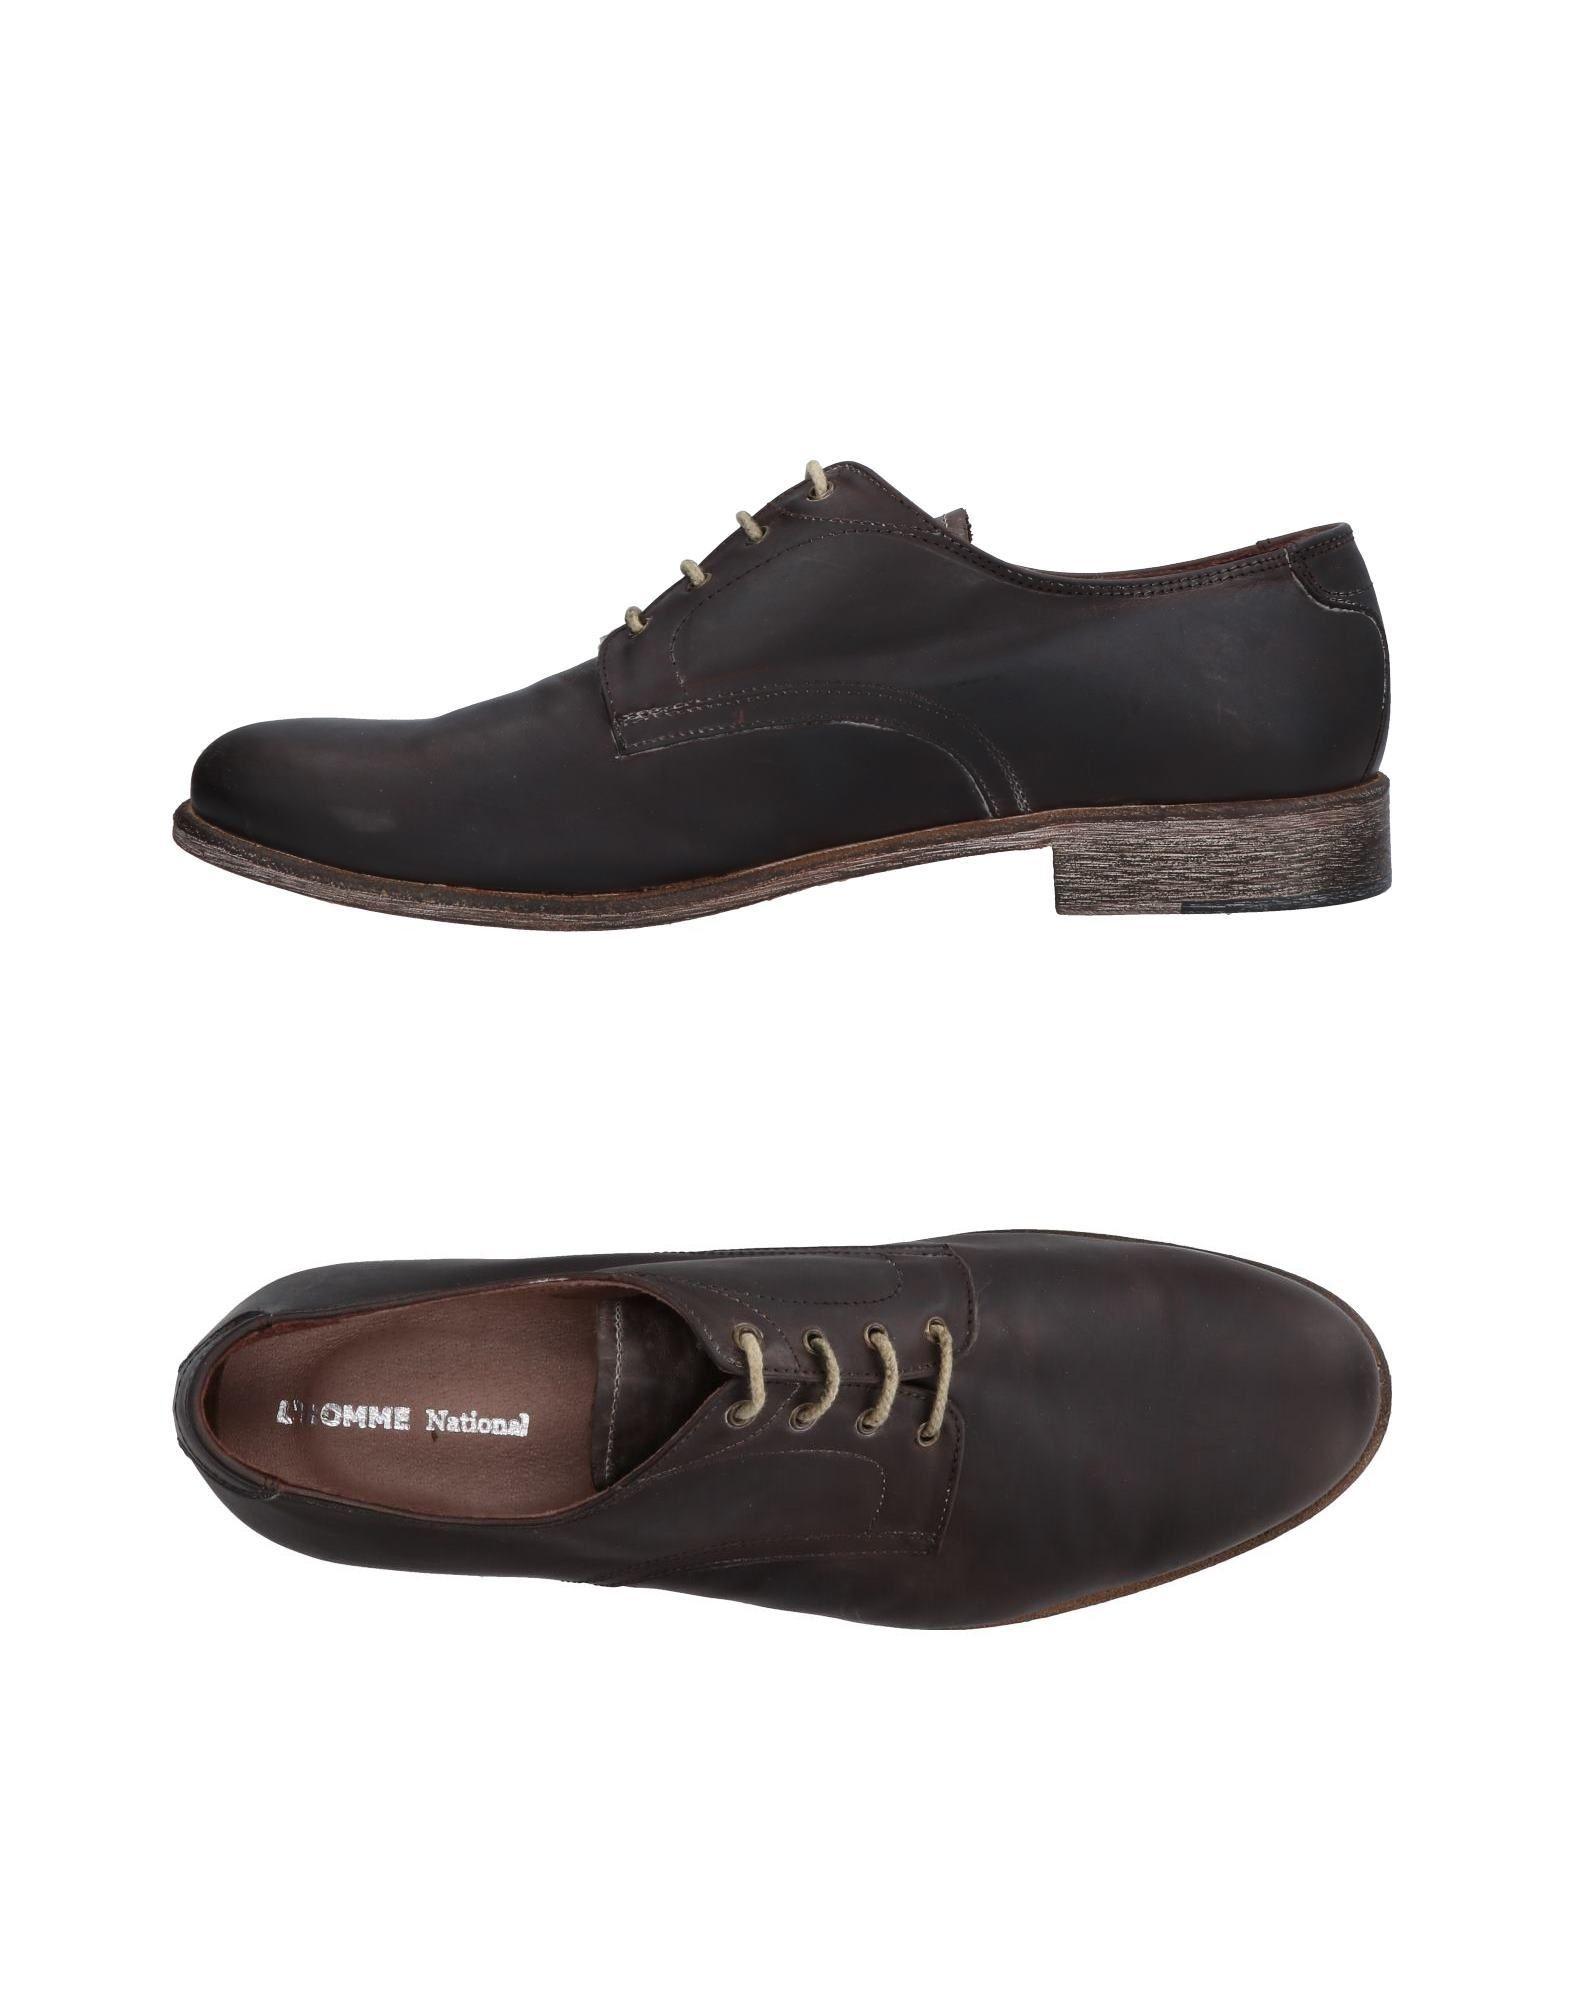 Rabatt echte Schuhe L'homme National Schnürschuhe Herren  11487805GE